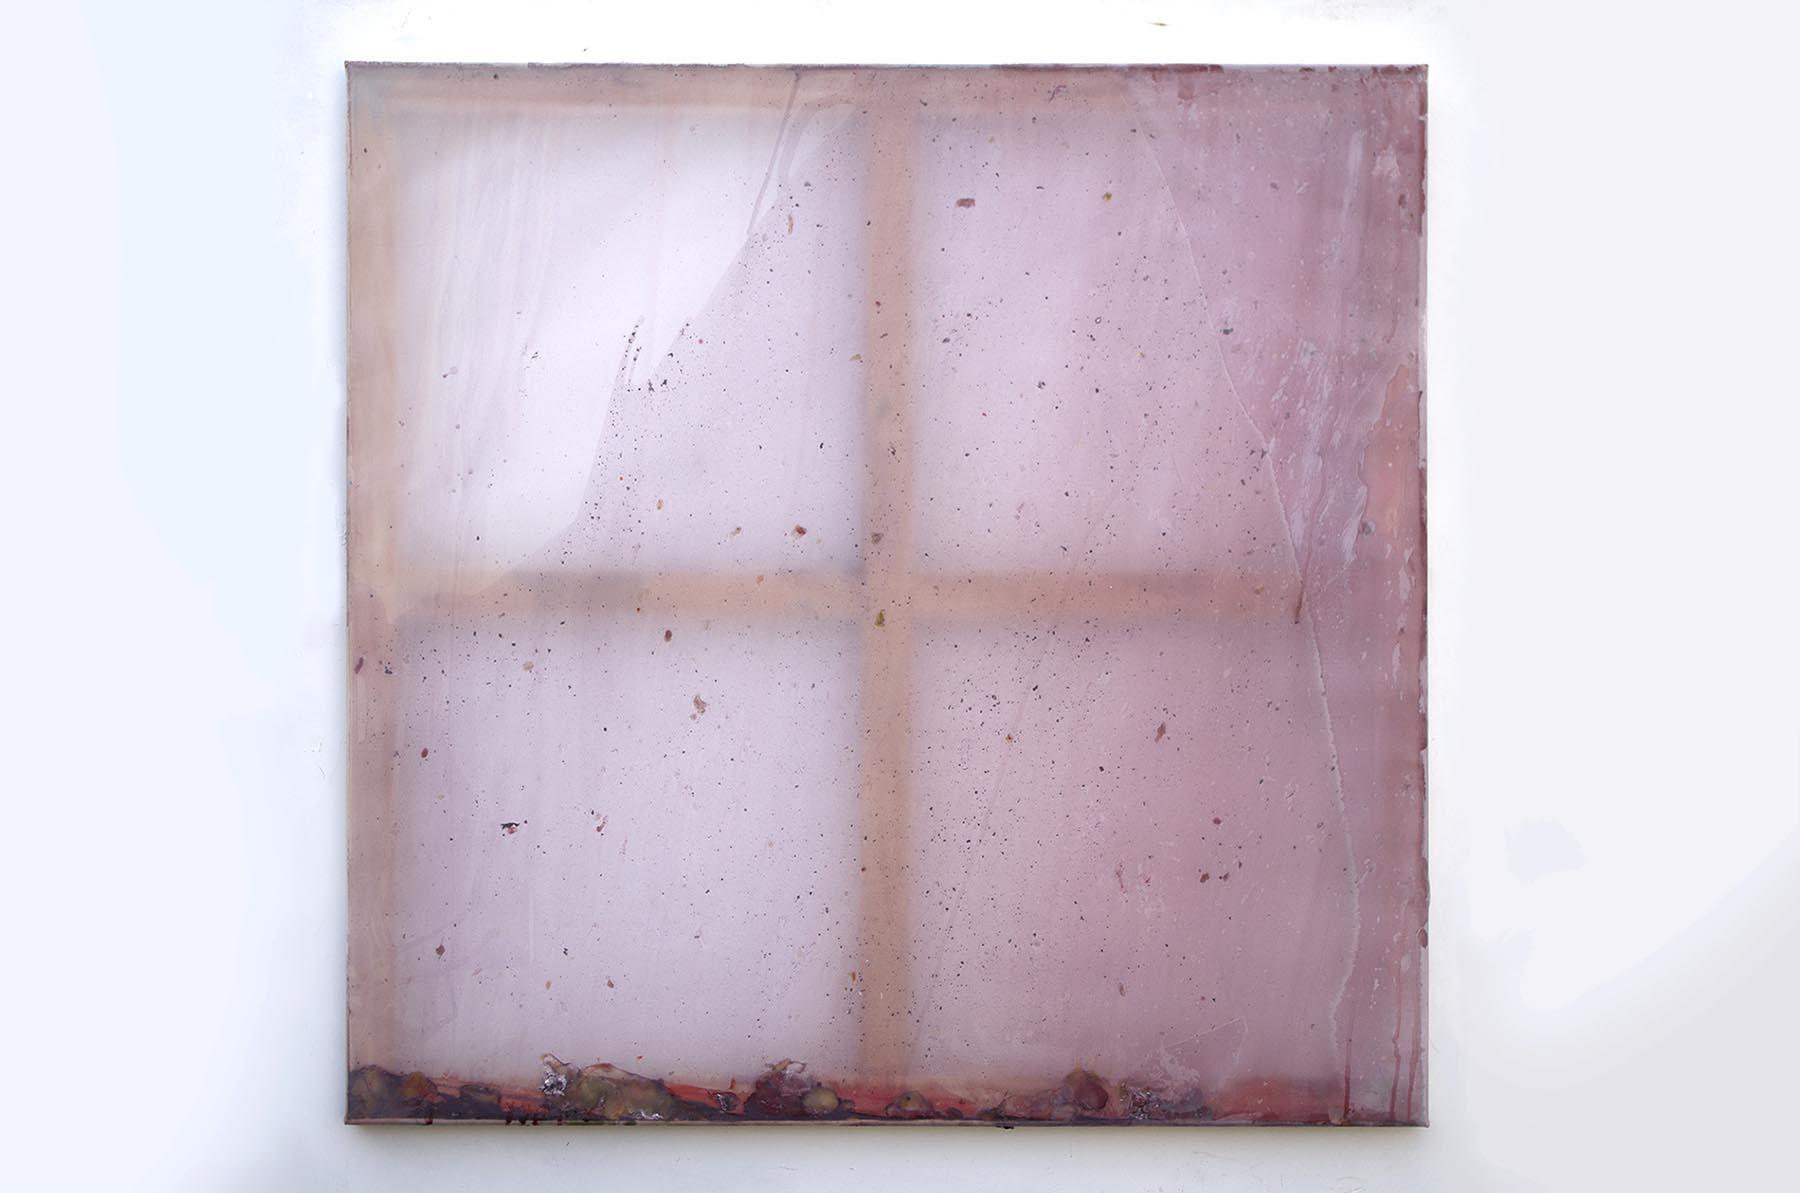 Rebecca Wallis, Deep sleep, 2018, acrylic and acrylic mediums behind silk over pine stretcher bars, 120x120x3.5cm